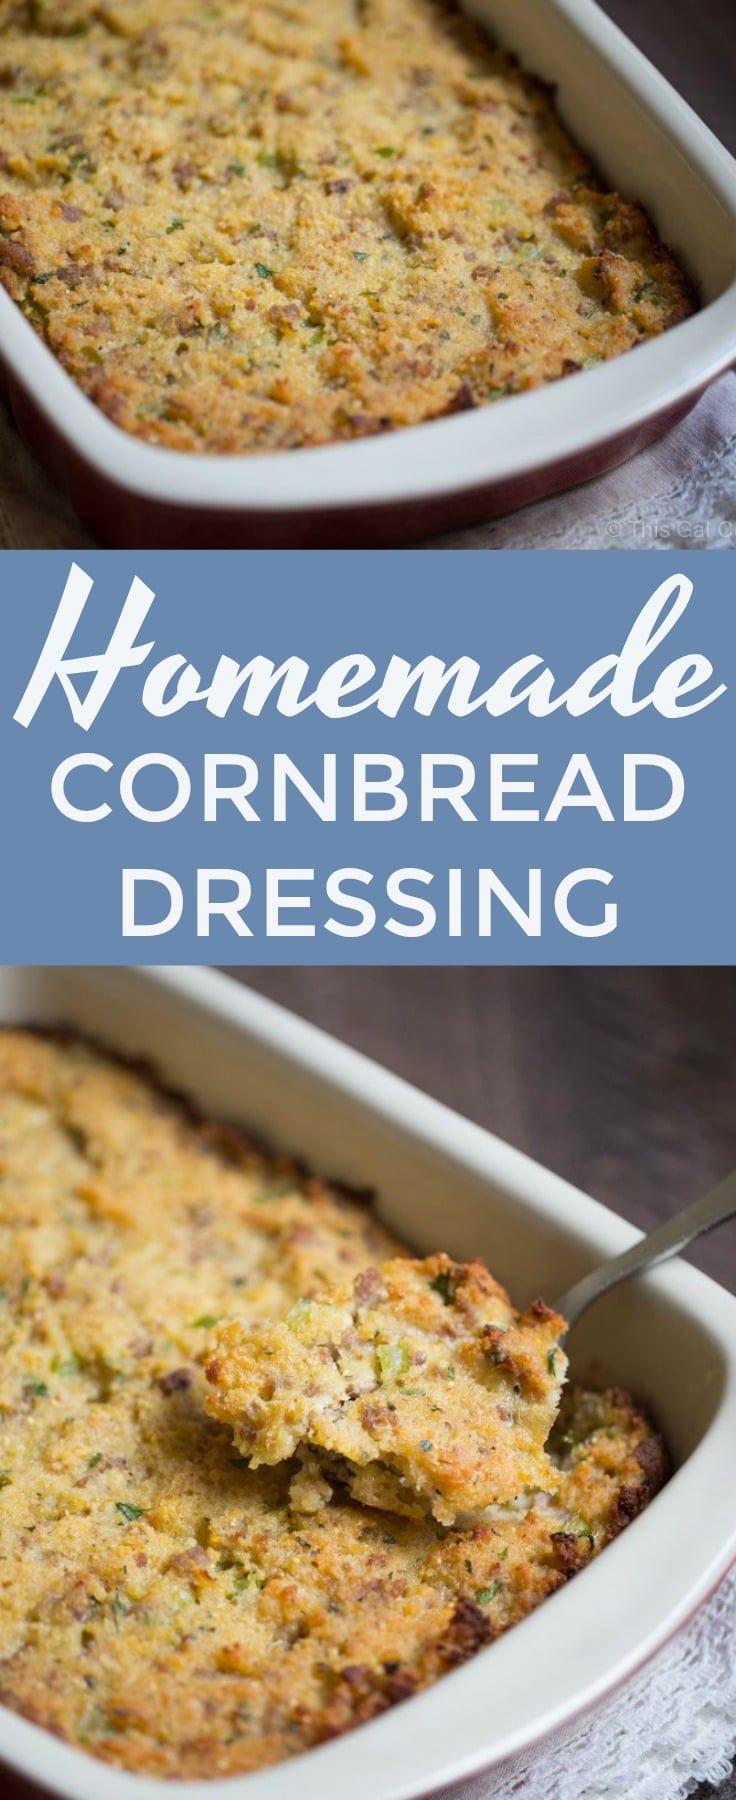 Homemade Cornbread Dressing  Homemade Cornbread Dressing